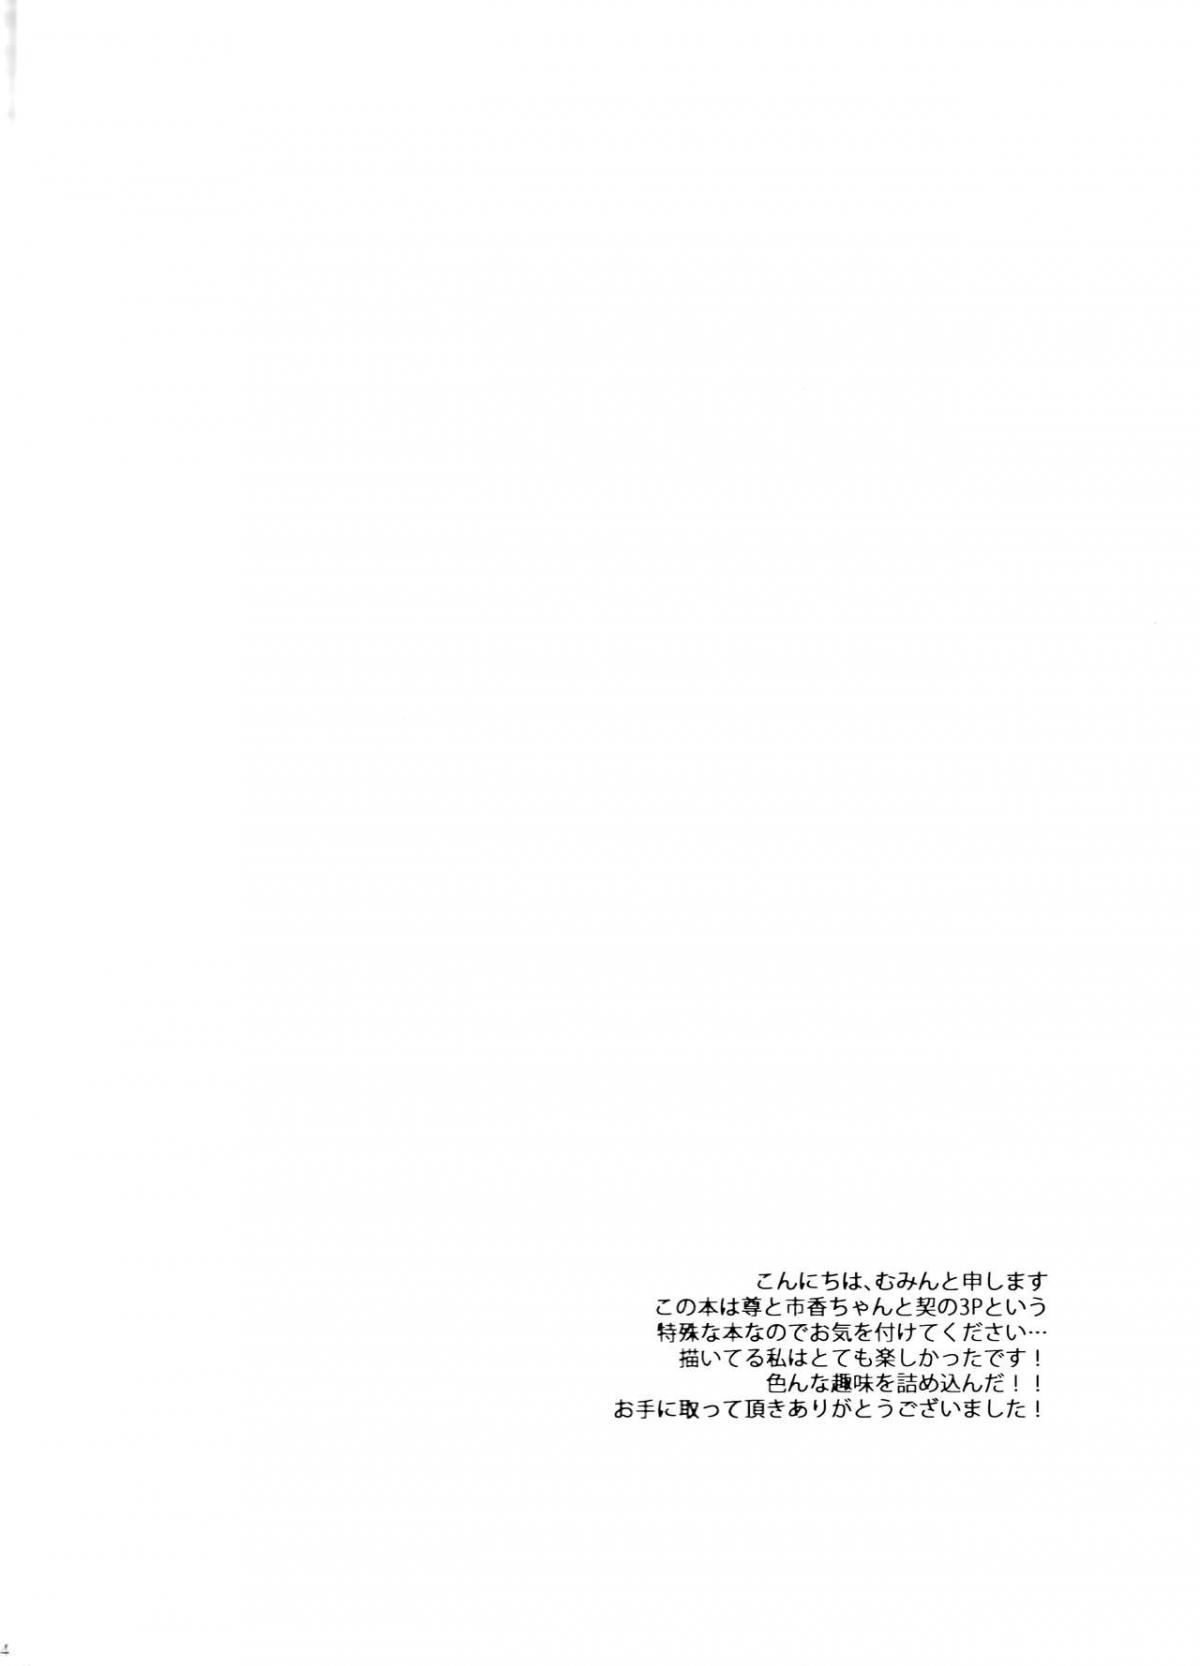 HentaiVN.net - Ảnh 5 - Yurari Oboreru Temptation (Collar x Malice) - Oneshot